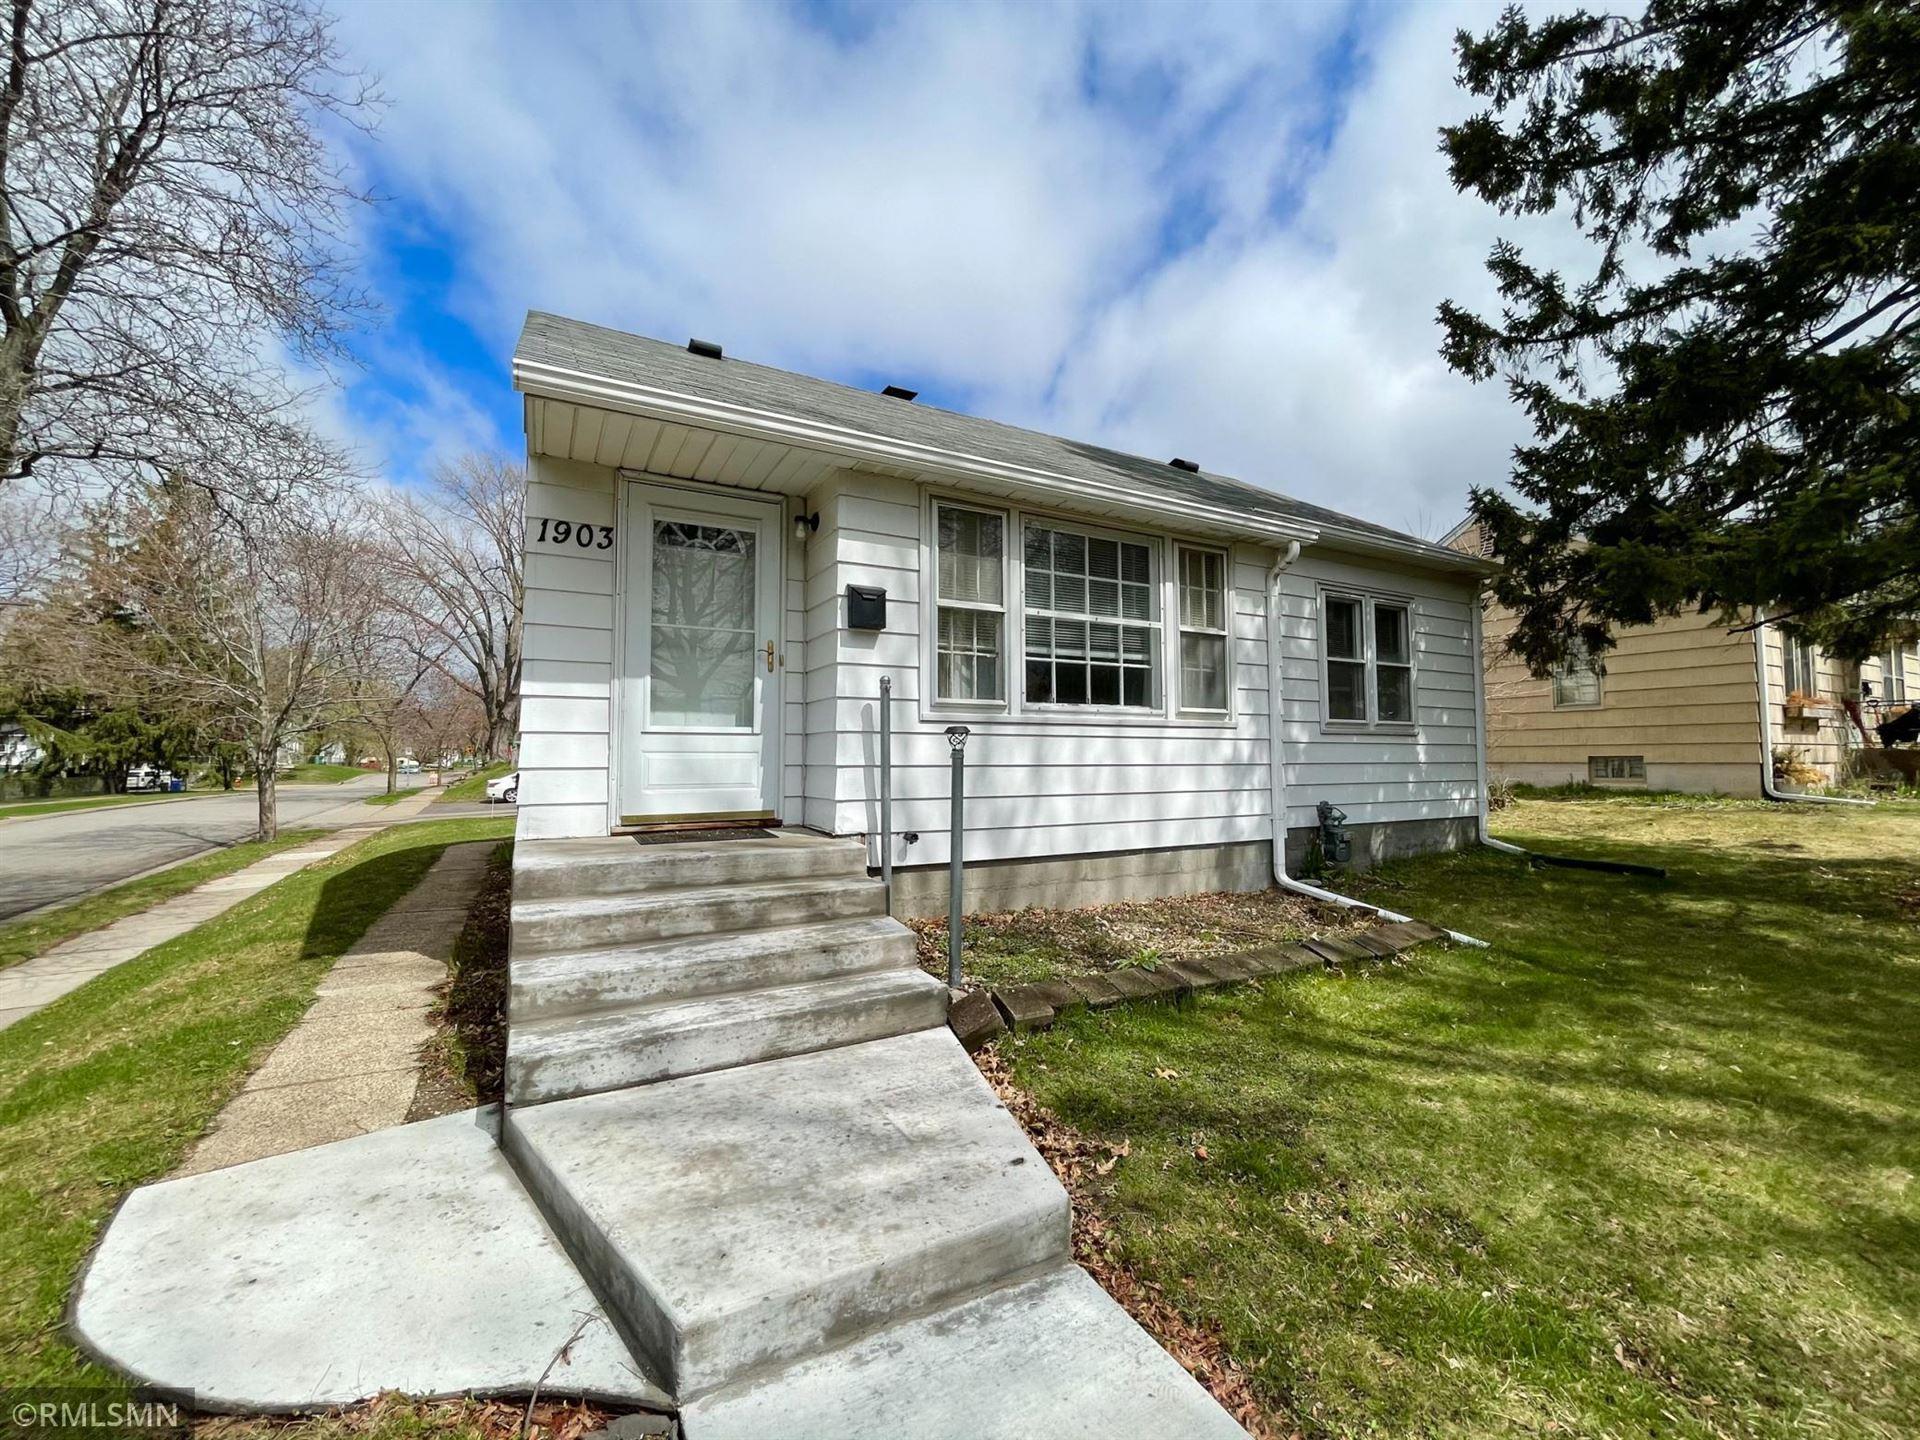 1903 Nebraska Avenue E, Saint Paul, MN 55119 - MLS#: 5740903